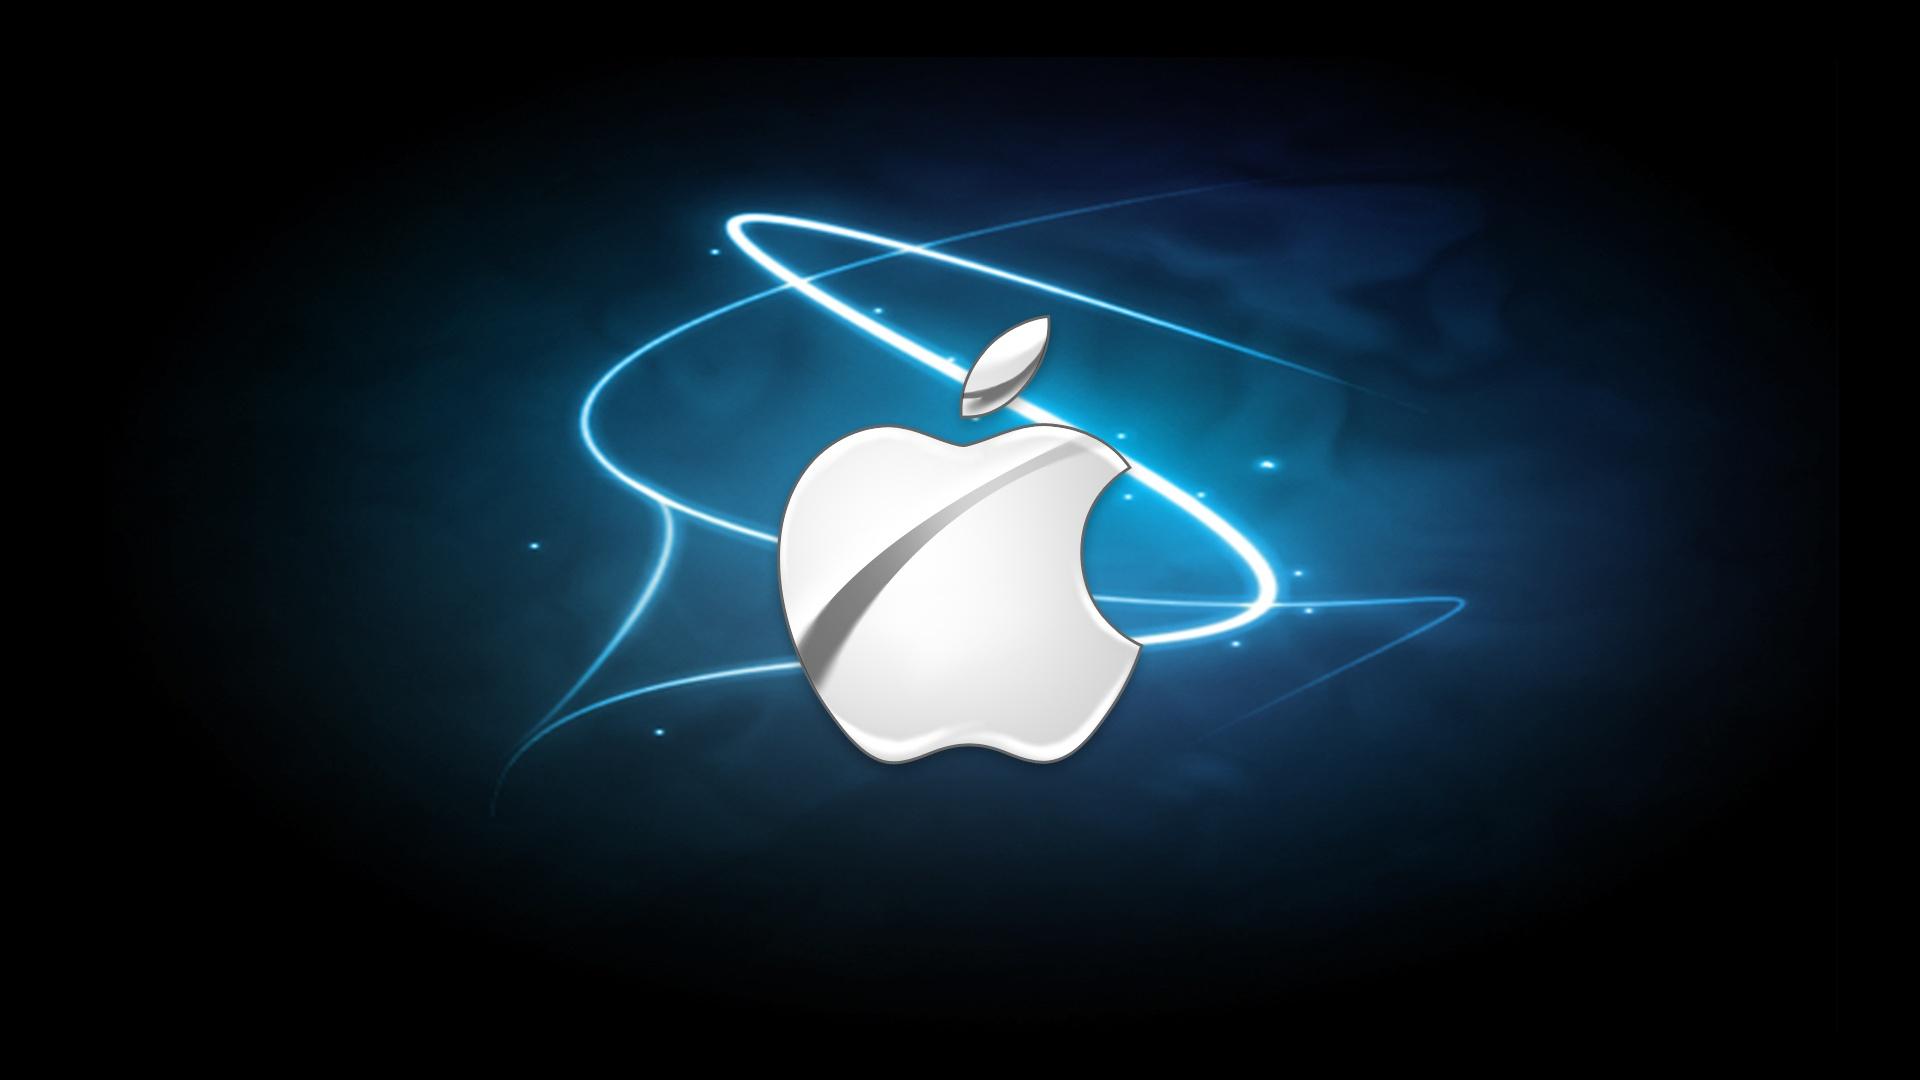 http://1.bp.blogspot.com/-cBC9N-OsqlY/UDaAkFBwBWI/AAAAAAAADwM/mjkCt6fukYw/s1920/apple_hd_2-1080.jpg